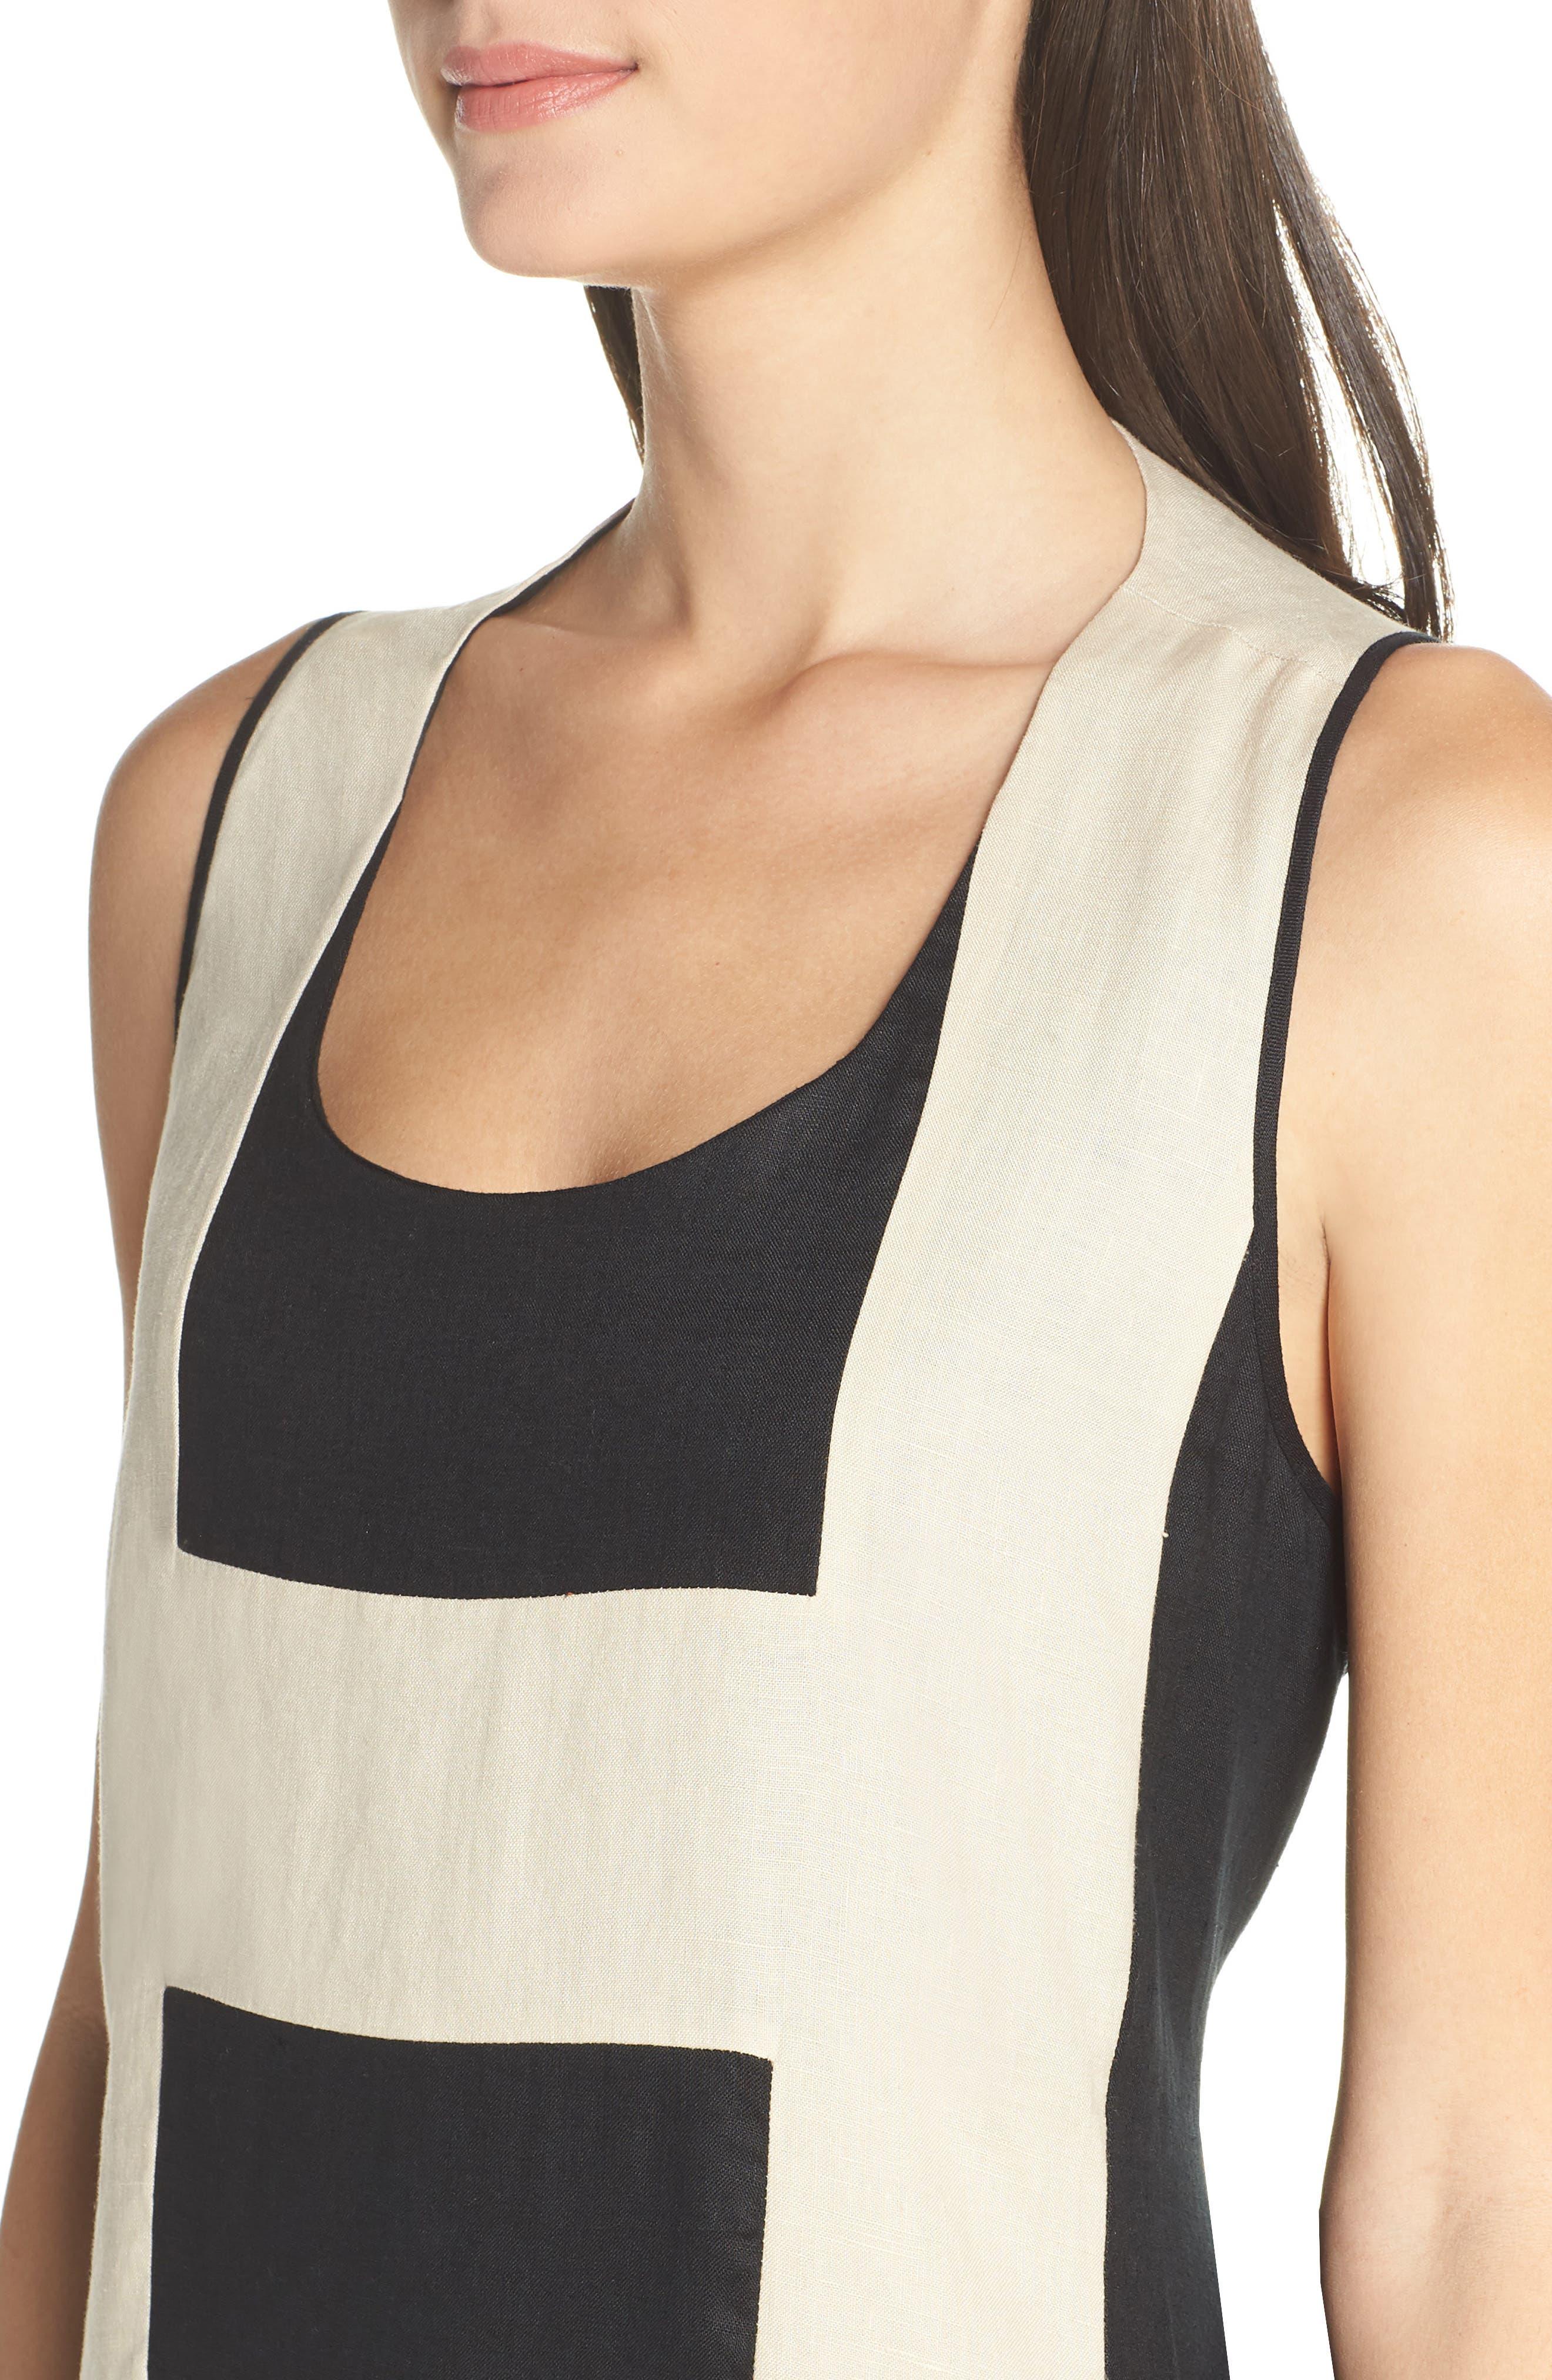 CAARA, Betha Colorblock Tie Back Dress, Alternate thumbnail 5, color, 001